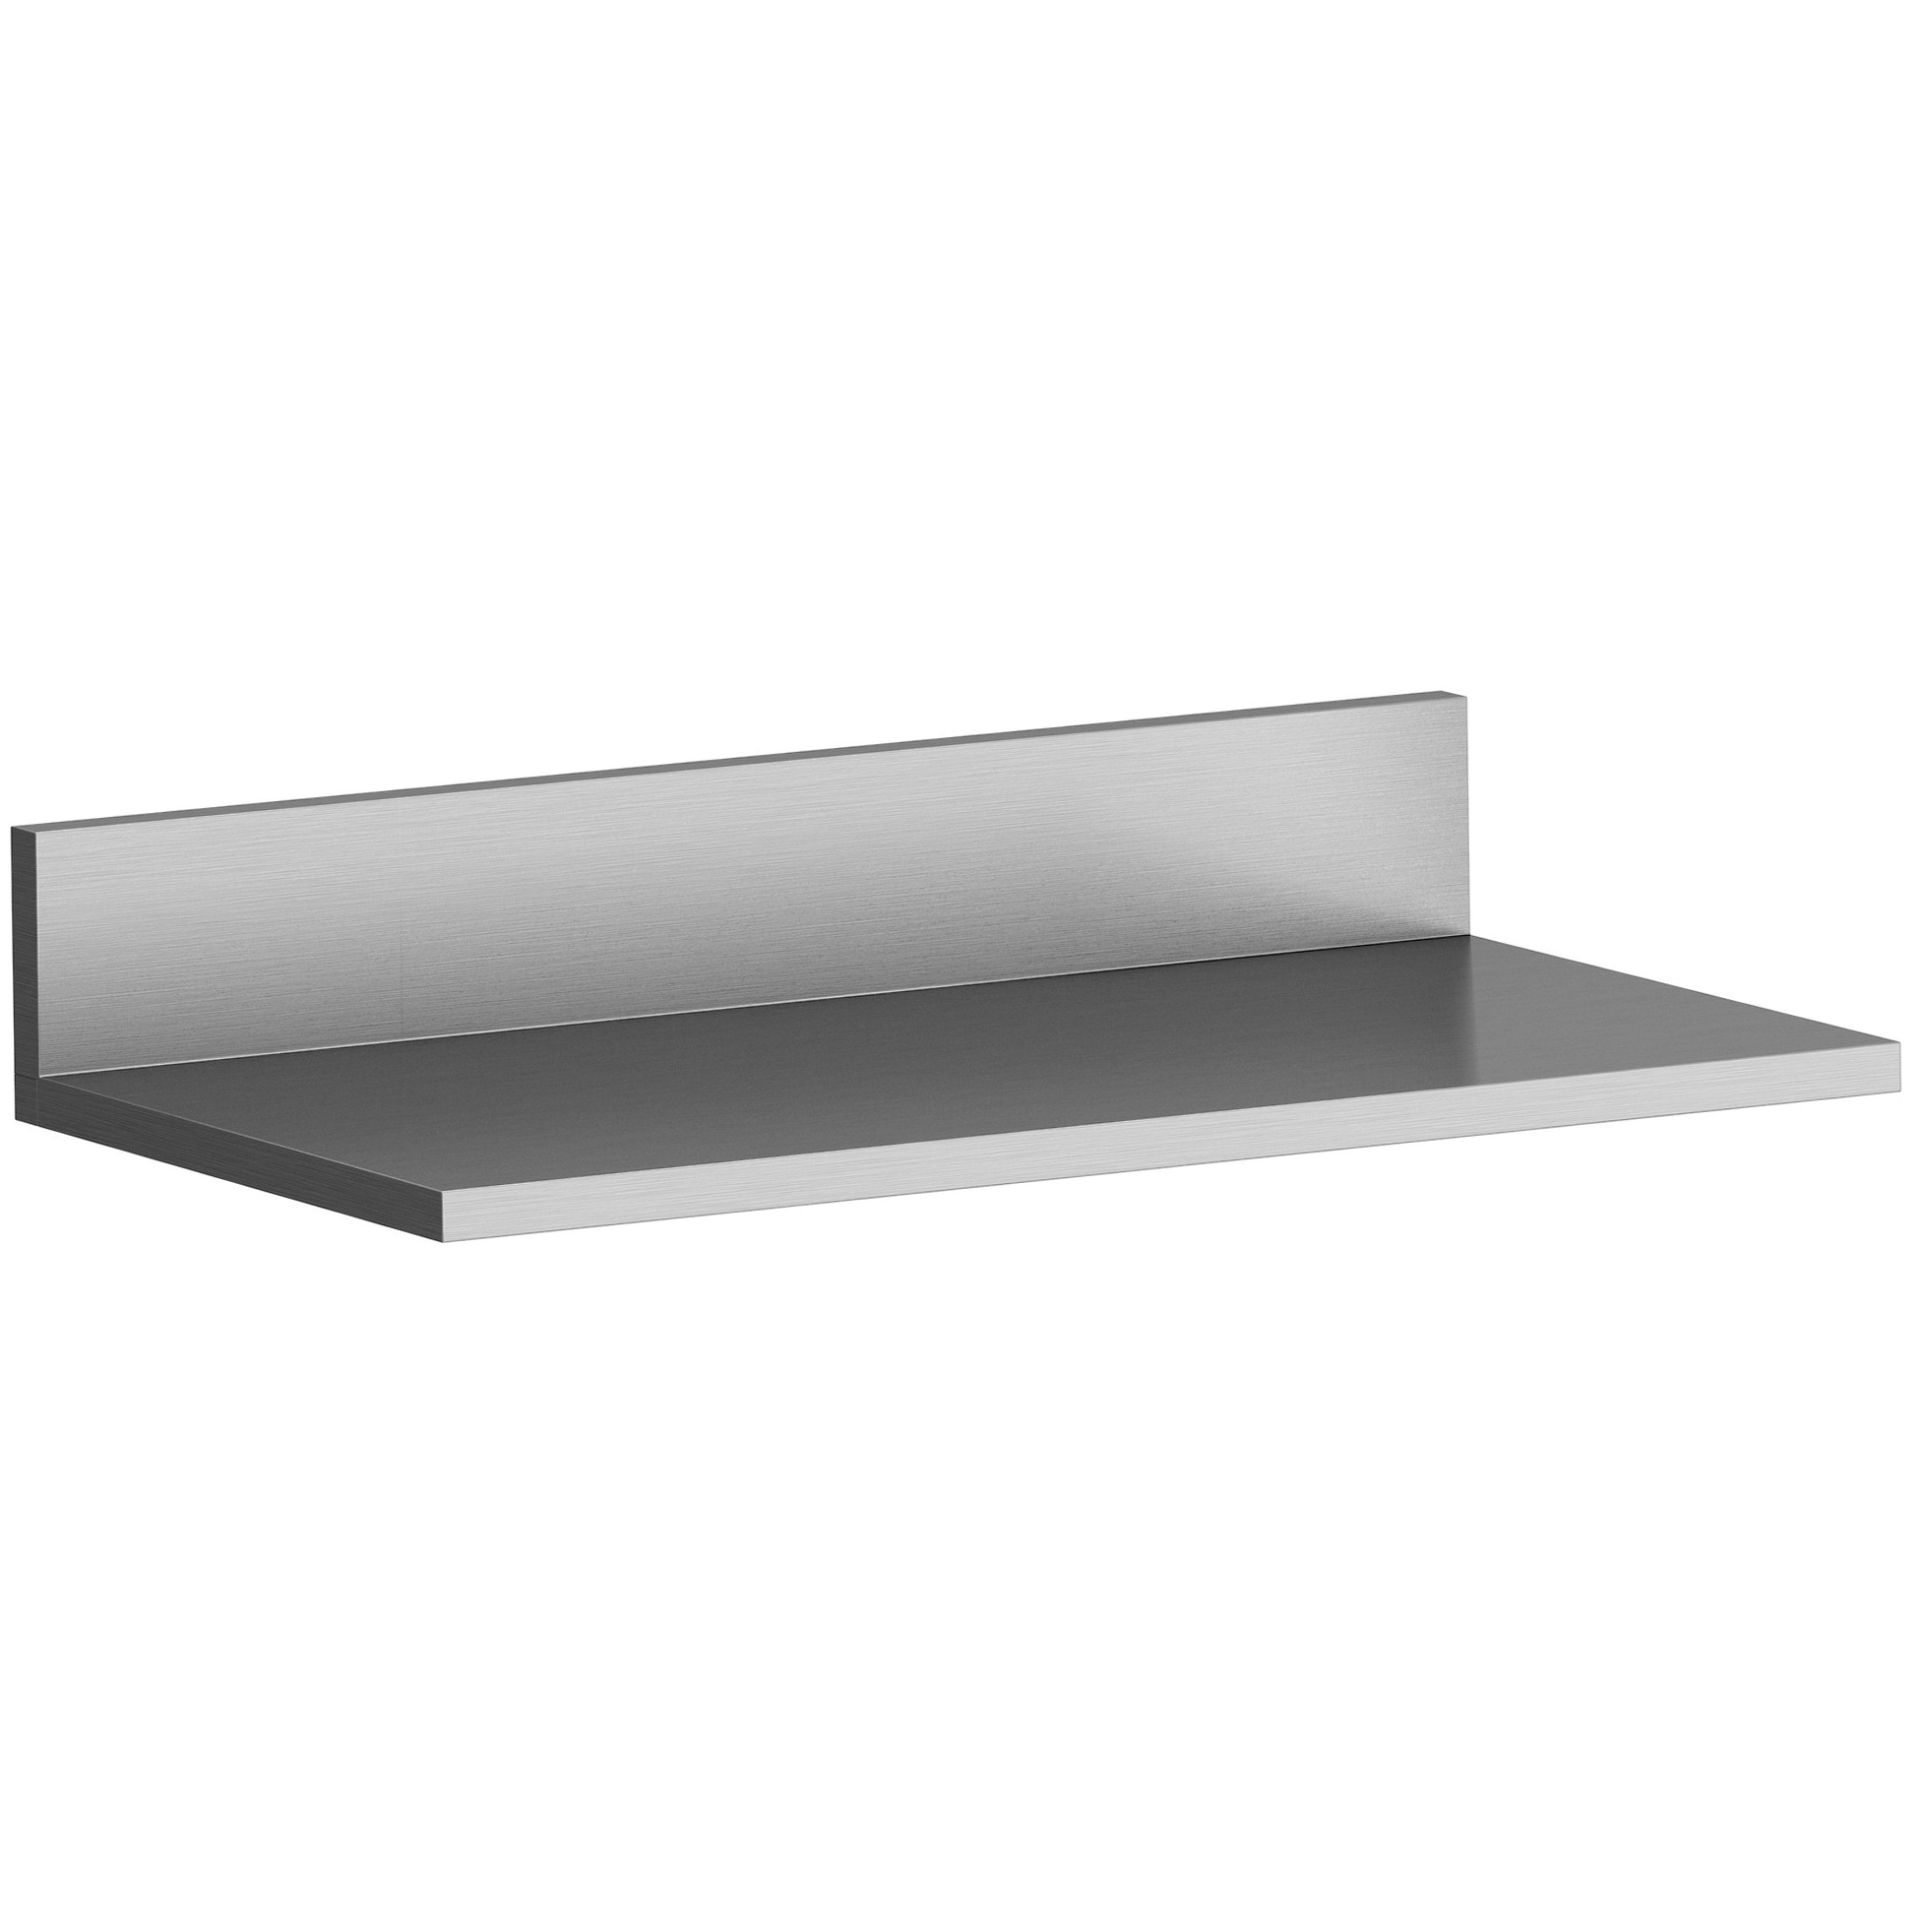 Ikea Metal Wall Shelves